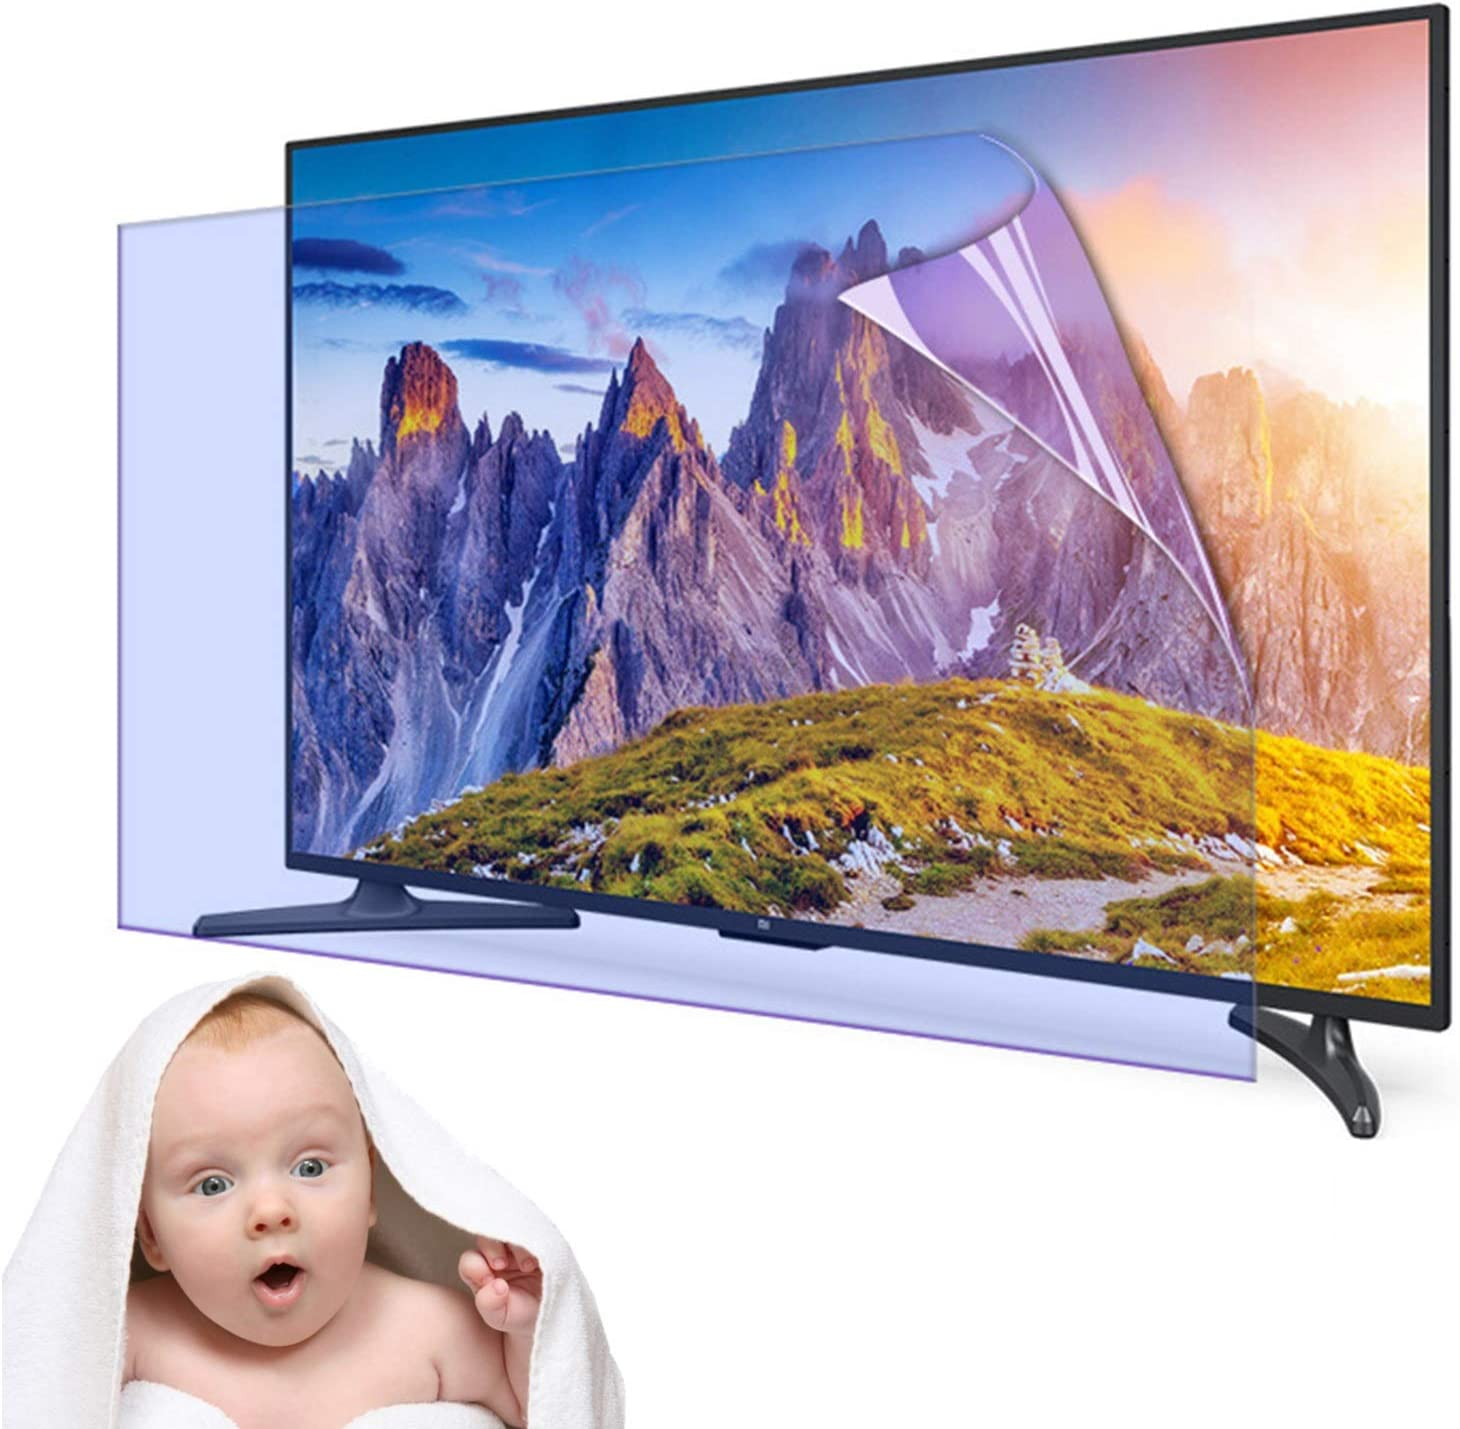 Matte LCD Eye Protection Protector Film Anti Very popular Blue Popular standard Light Scre TV